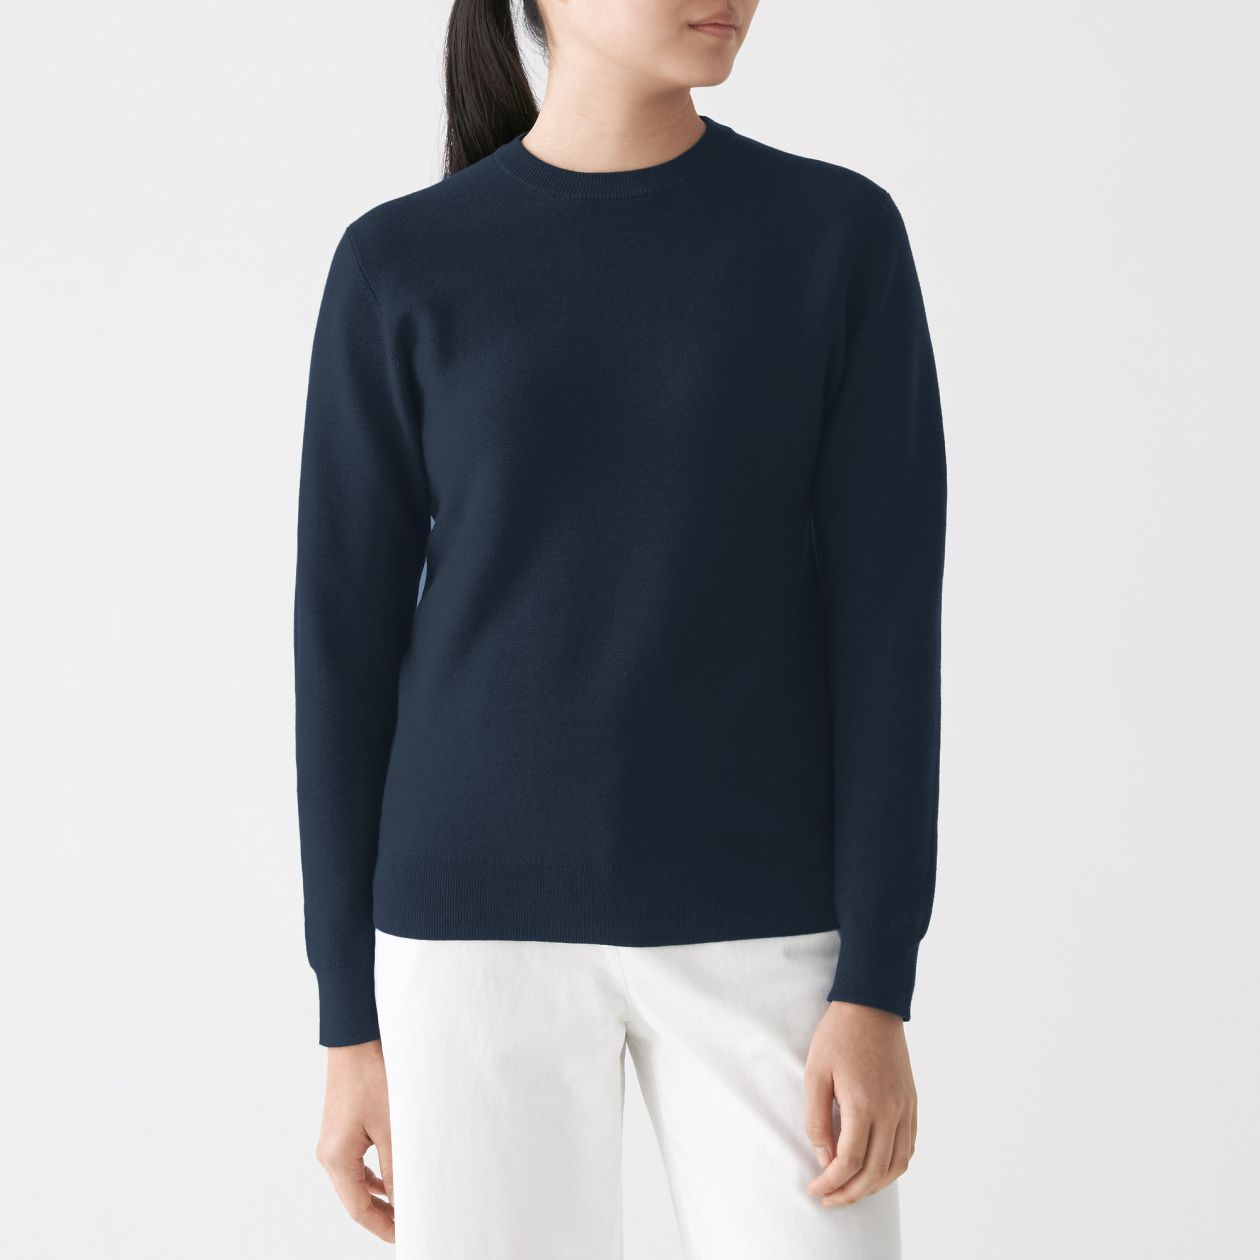 82ad69ec5 Ladies' Organic Cotton Silk Crew Neck Sweater   無印良品 MUJI